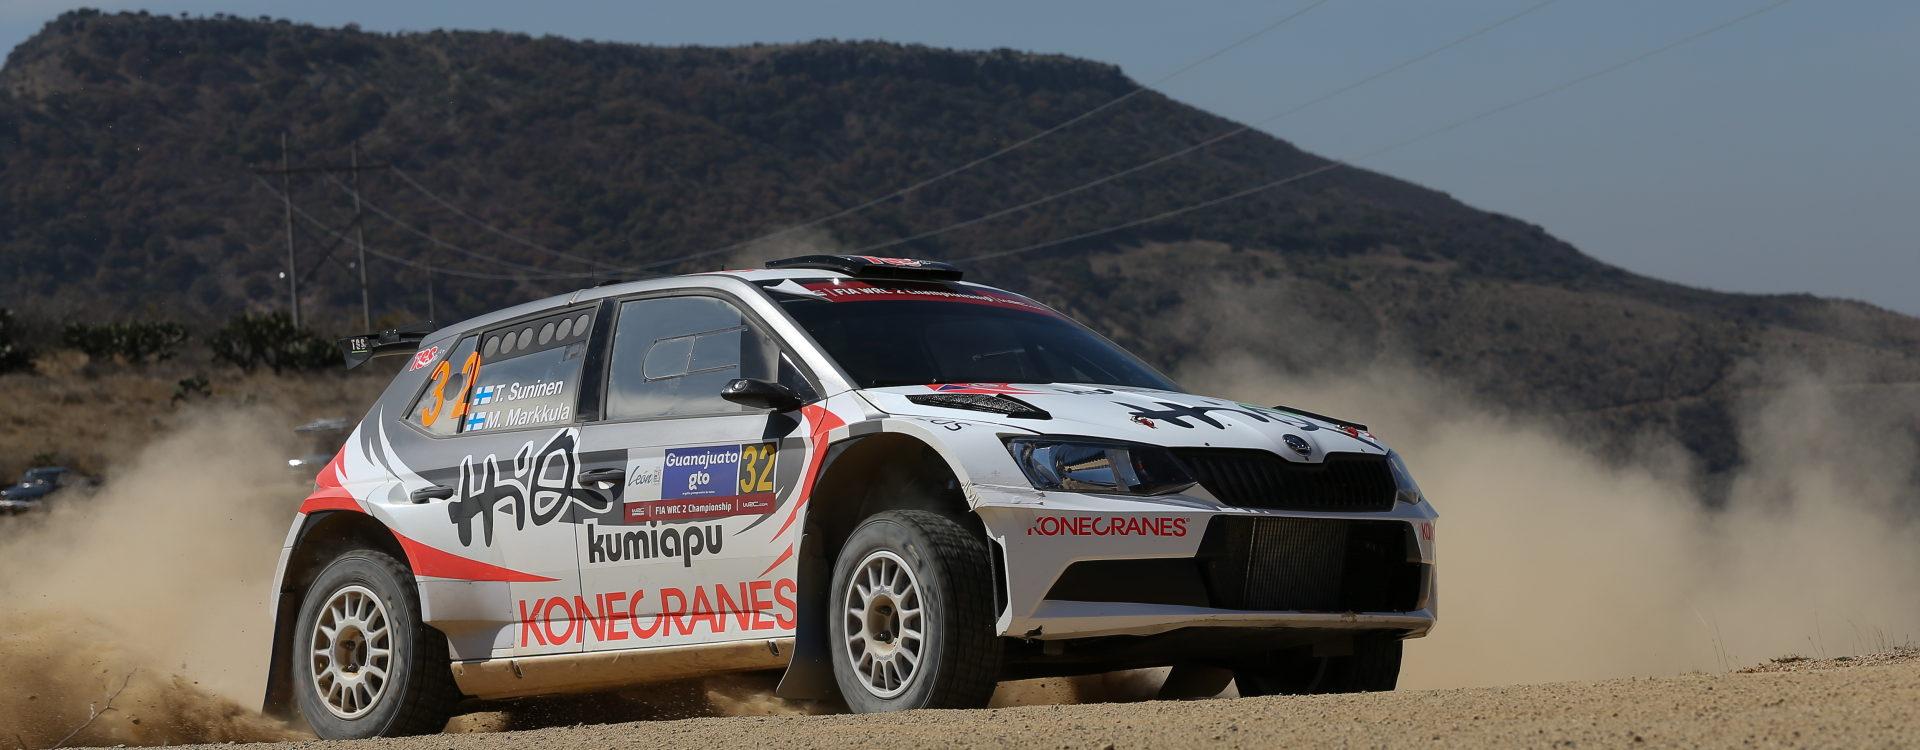 Ten ŠKODA Fabia R5 cars on the entry list of the Rally de Portugal